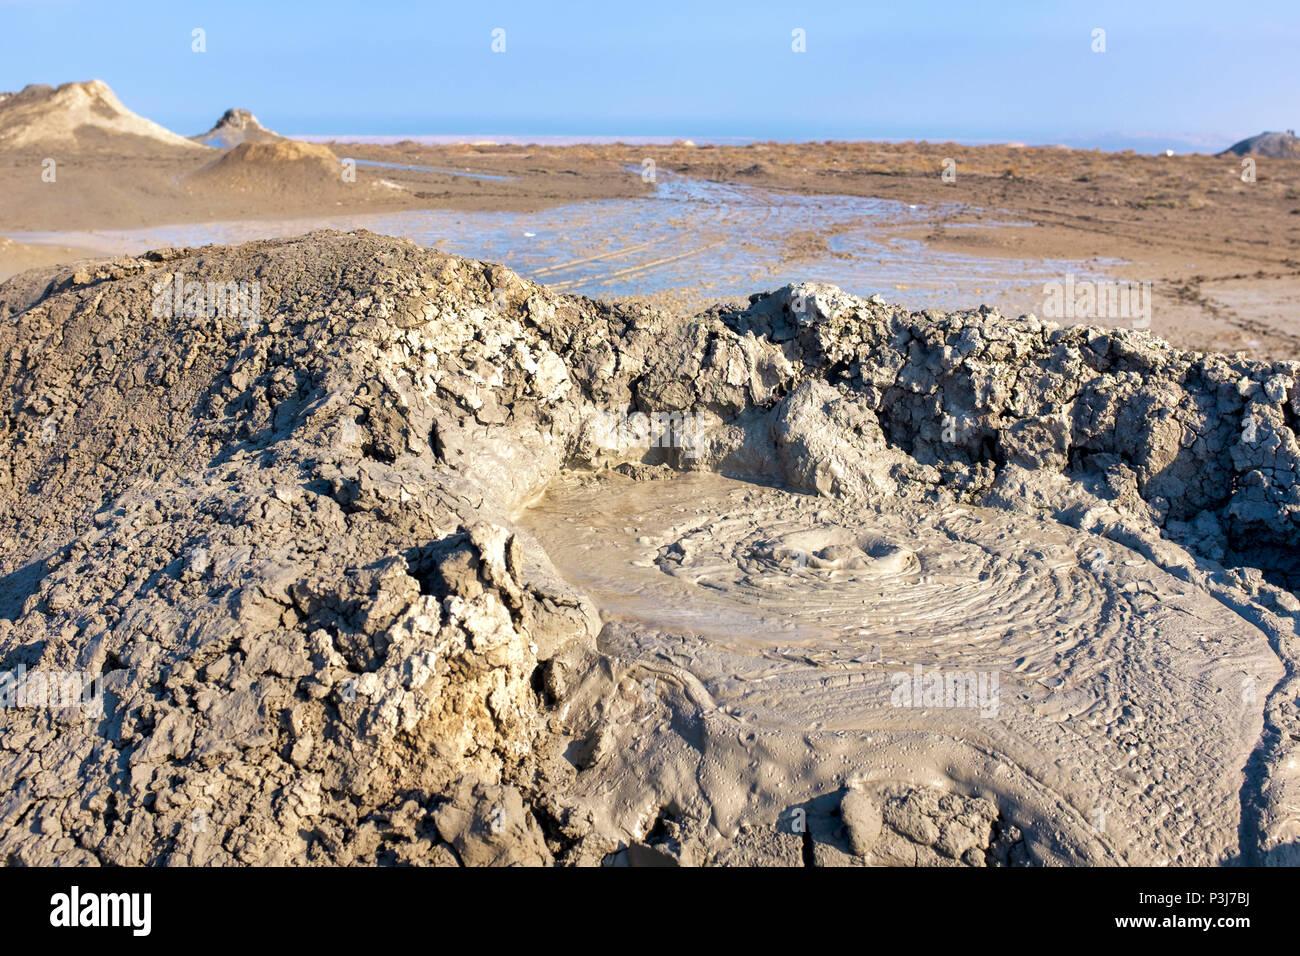 Vulcano di fango in Gobustan National Park, Azerbaigian Immagini Stock